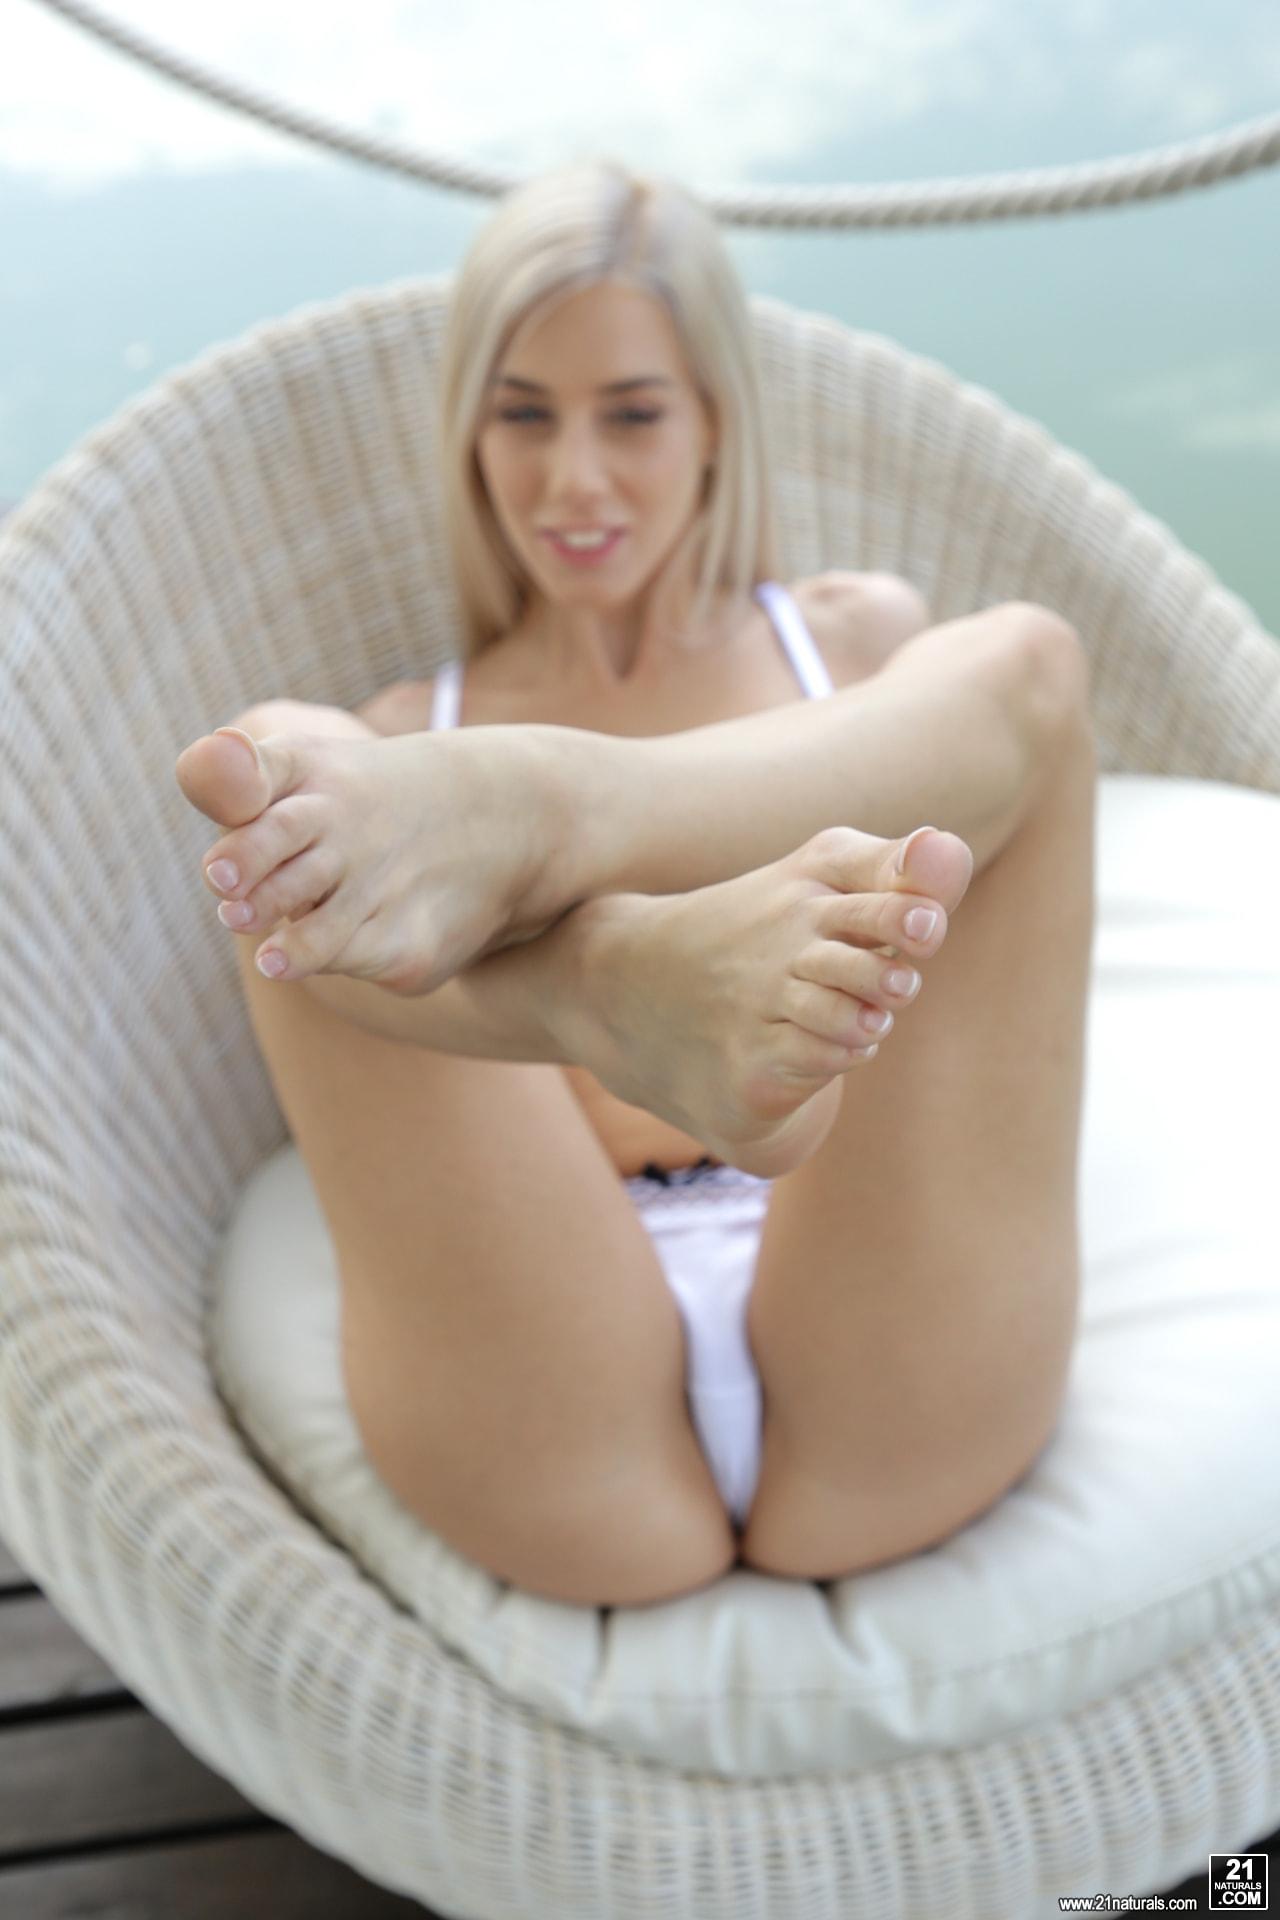 21Sextury 'Kiss My Feet' starring Nesty (Photo 22)